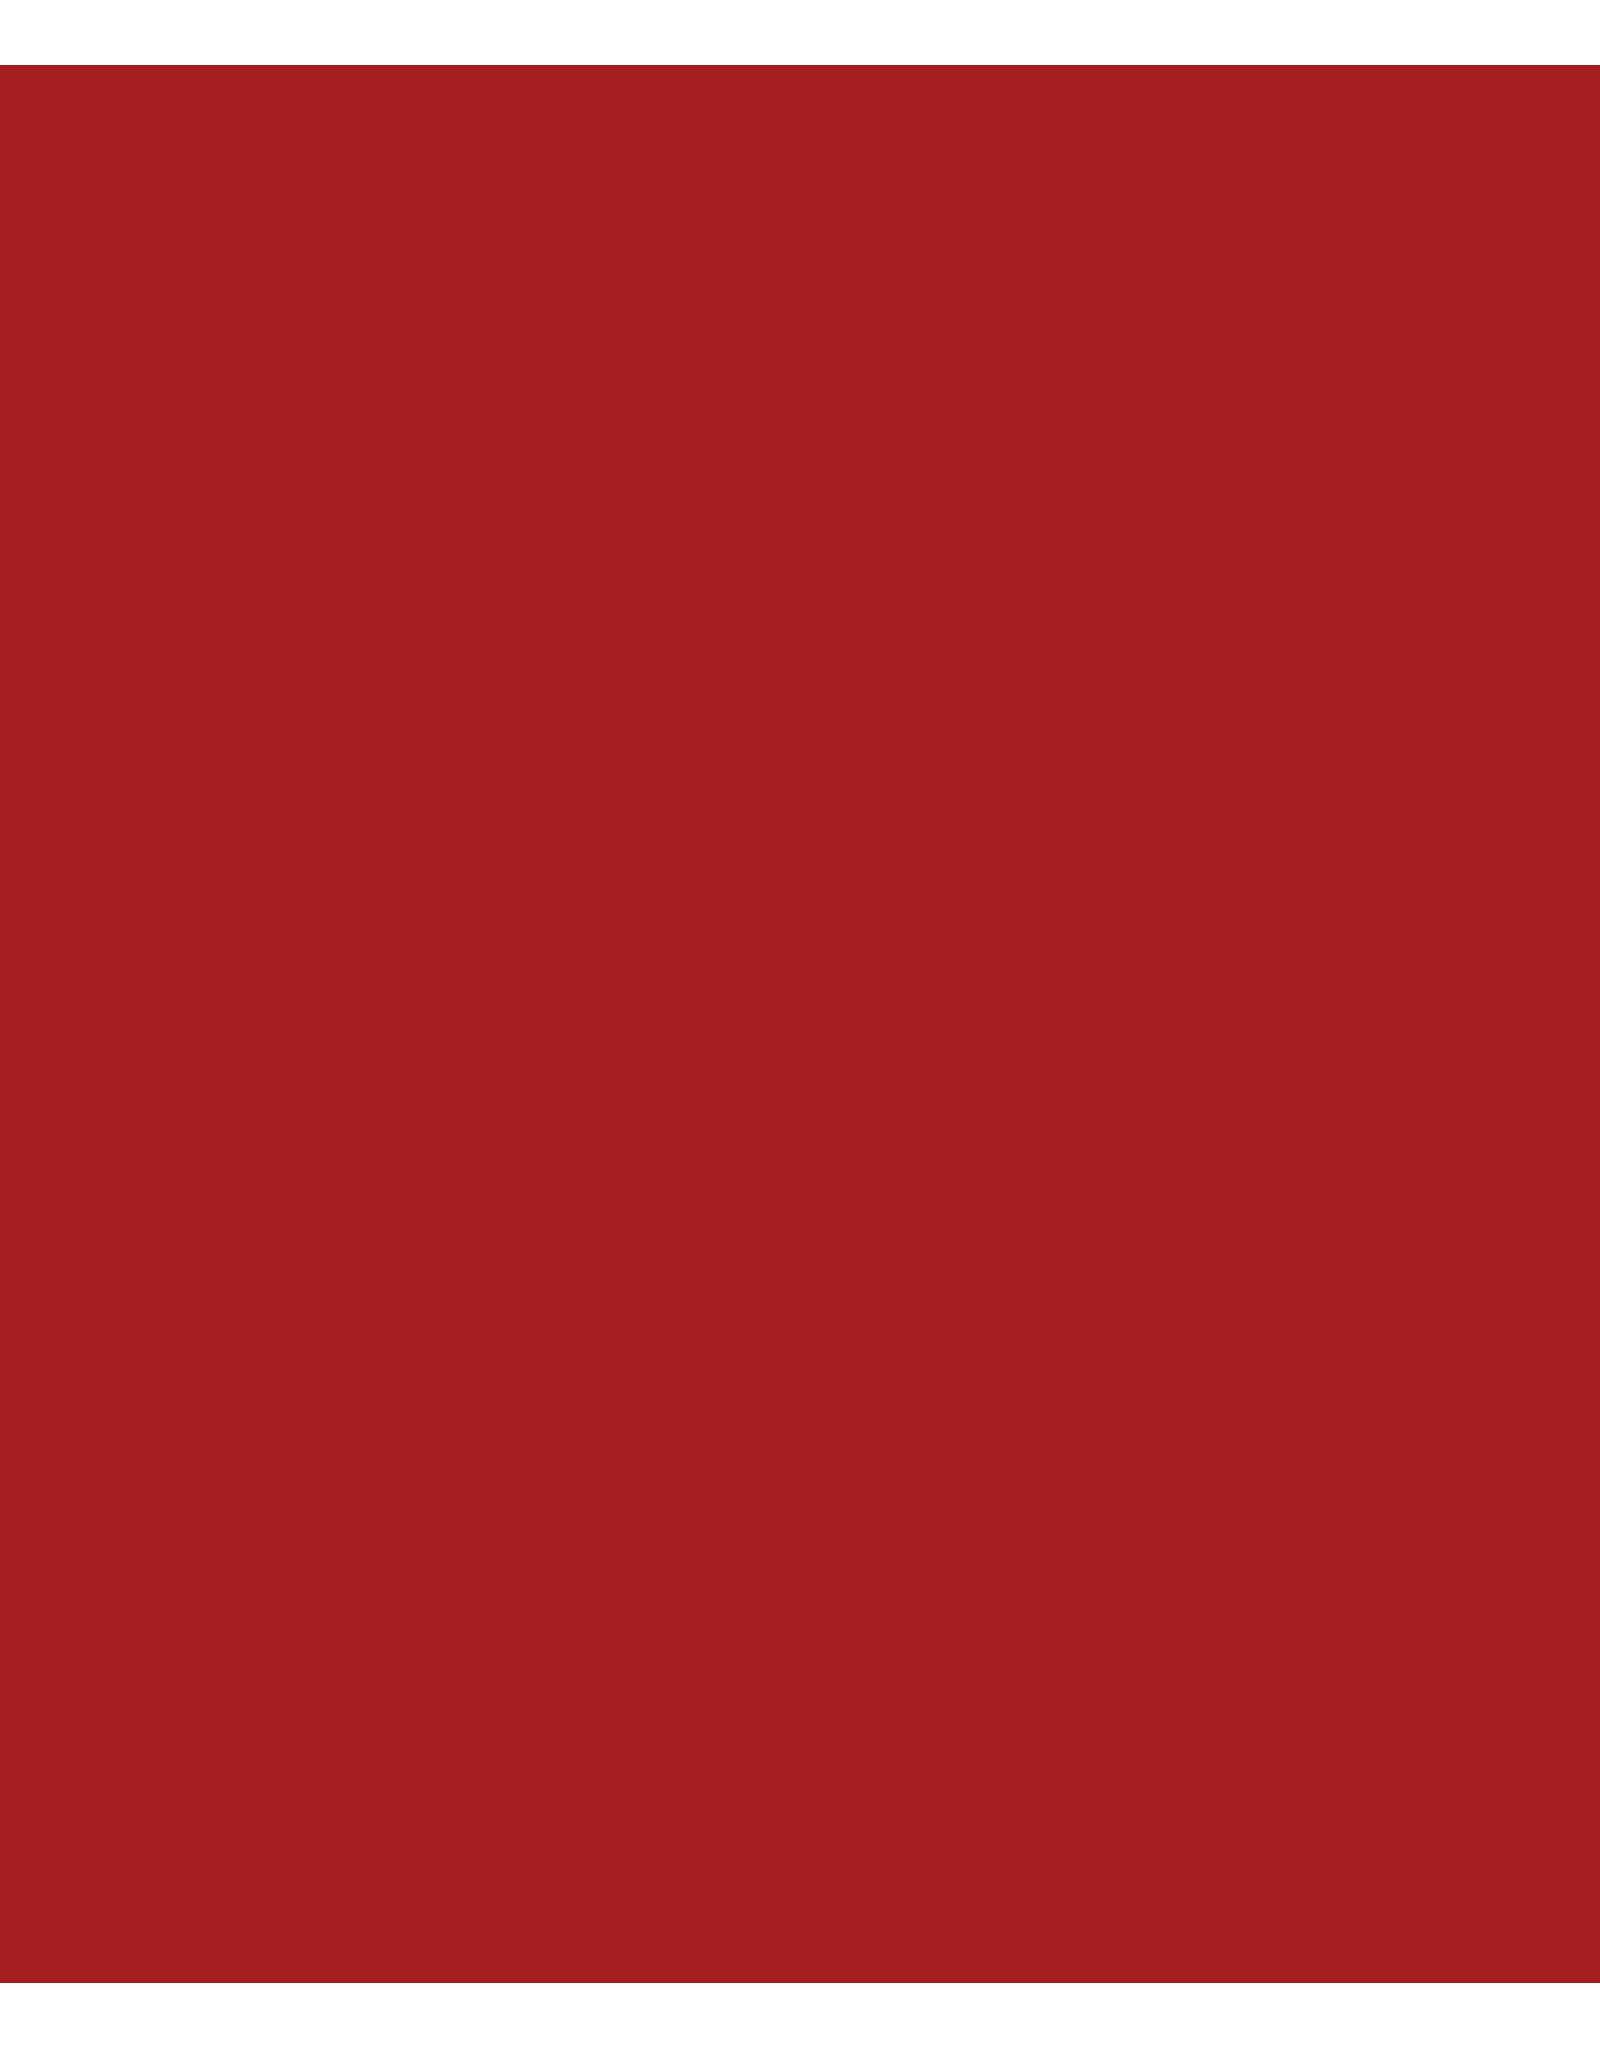 Bazzill Bazzill Card Shoppe 8.5x11 - Wax Lips